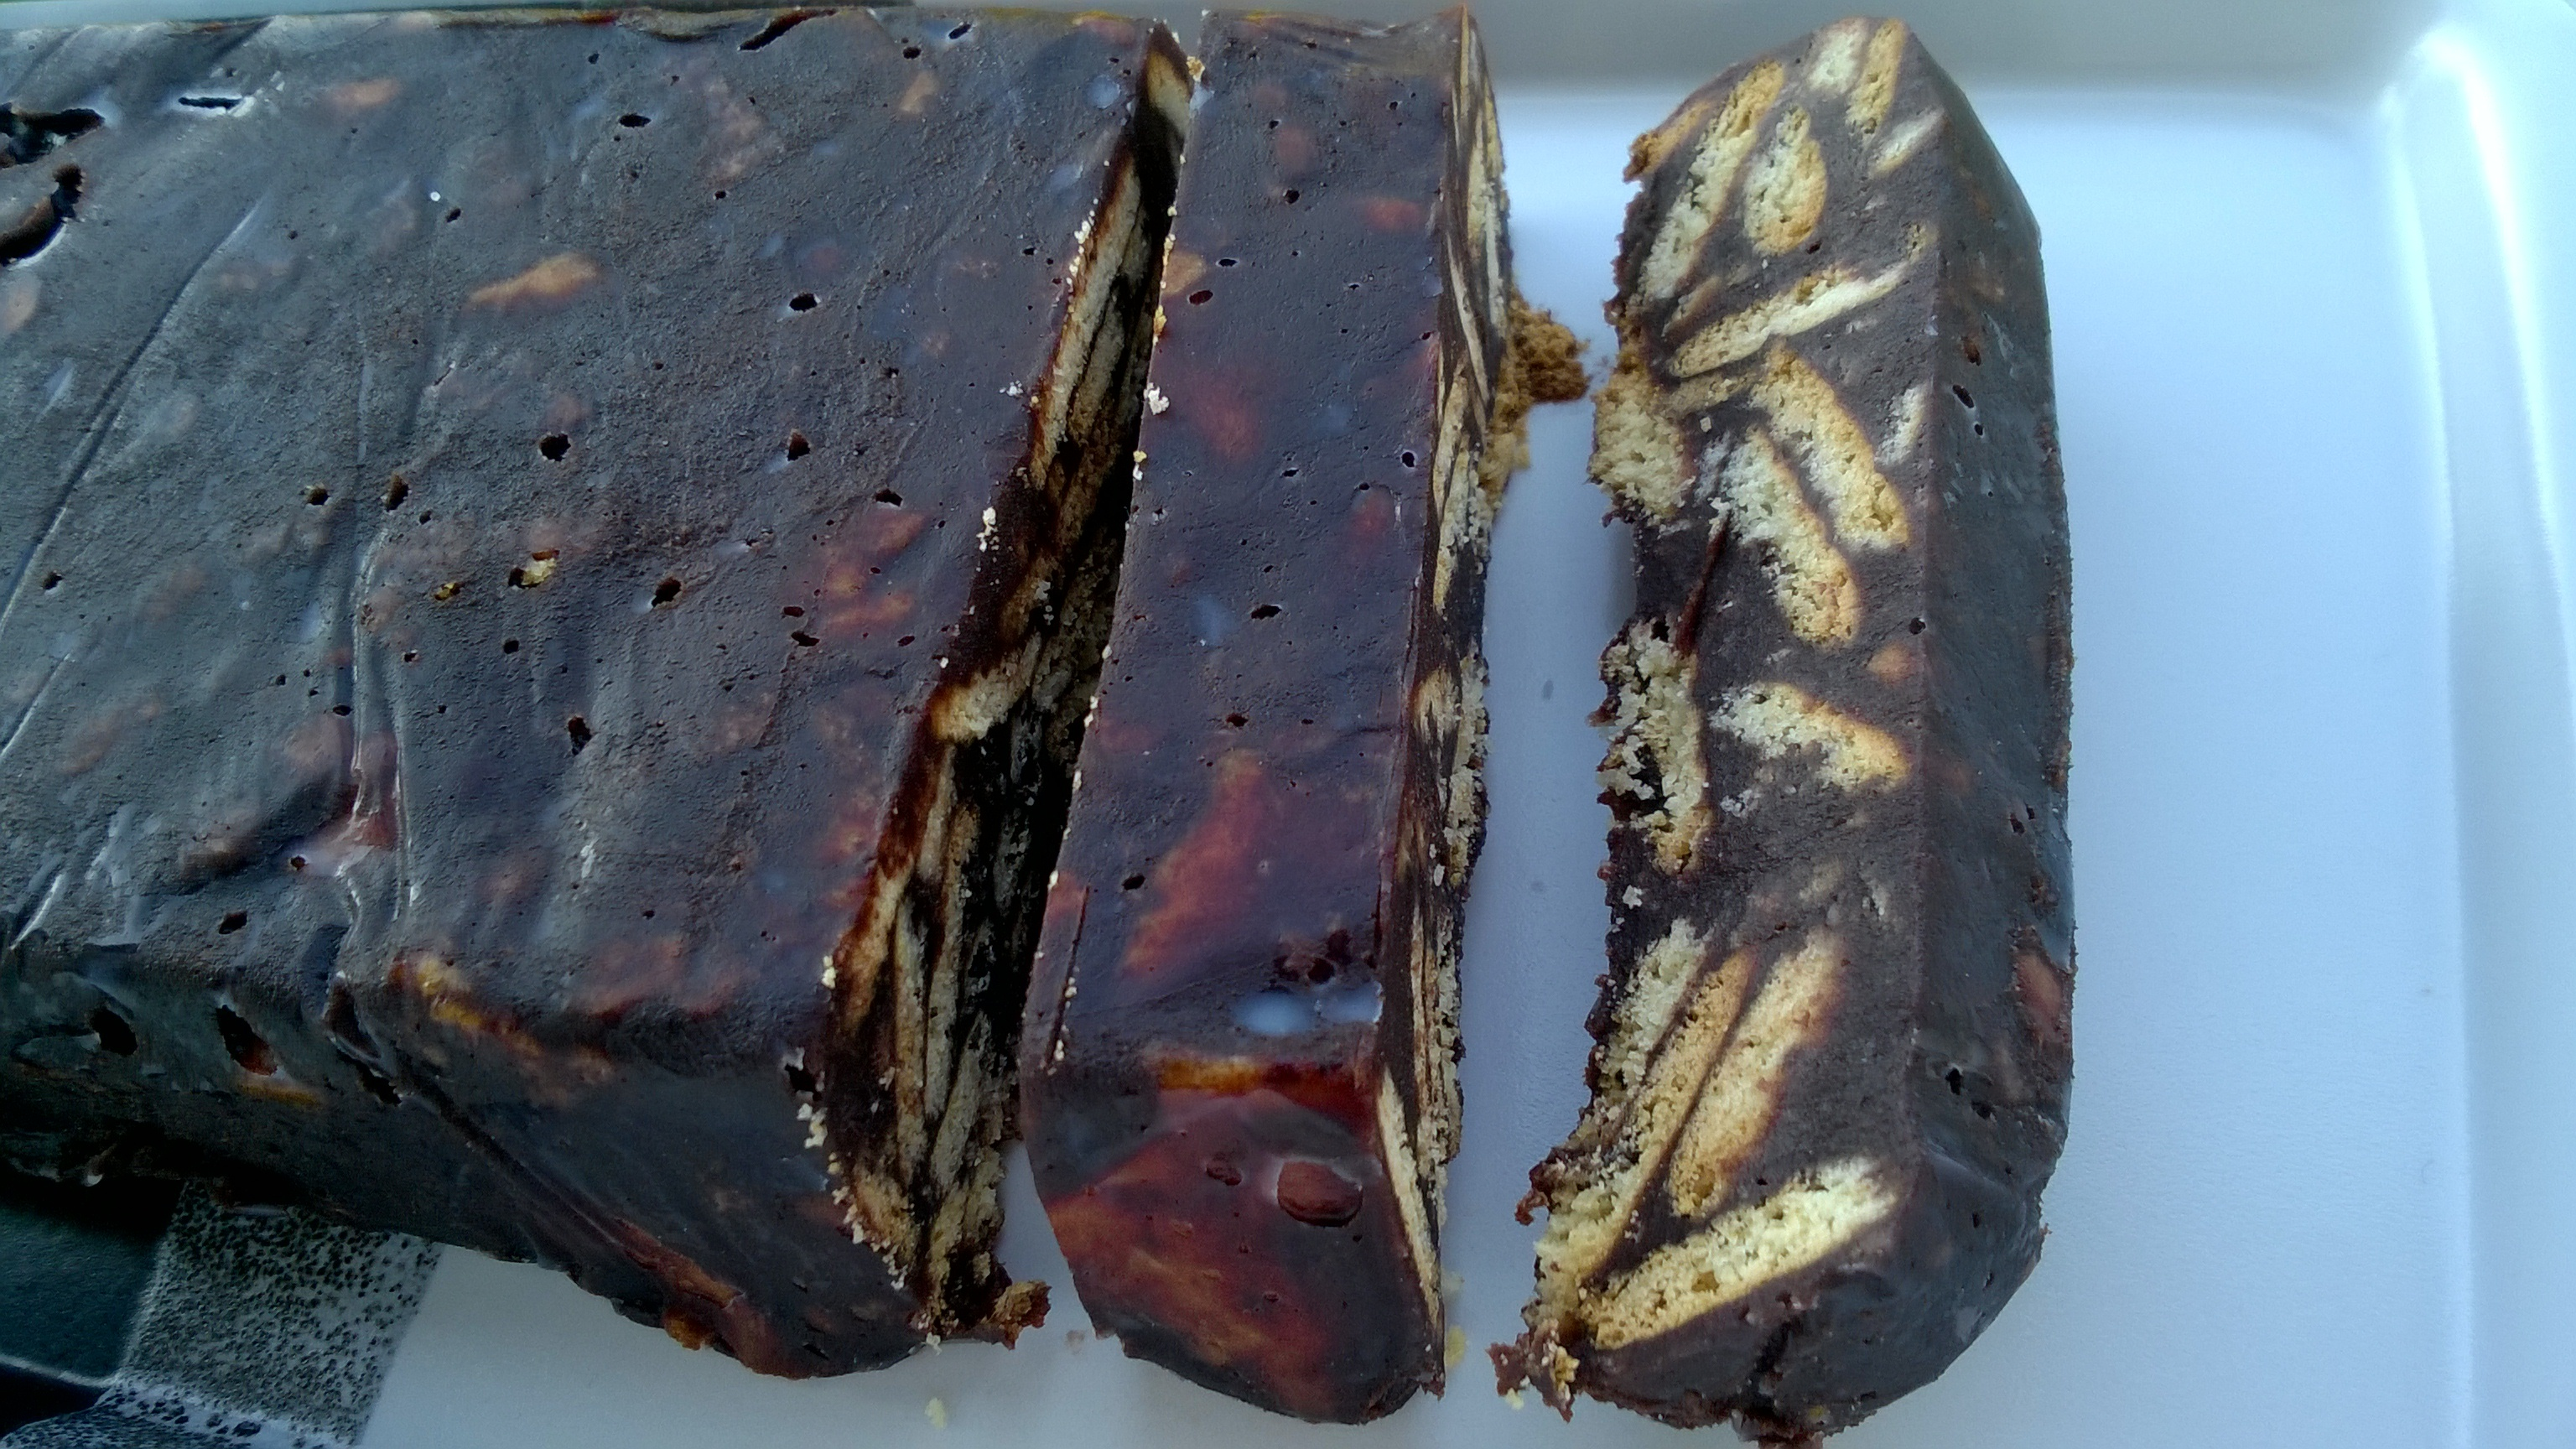 Thumbnail for Biscuit au chocolat – بسكوت بالشوكولا